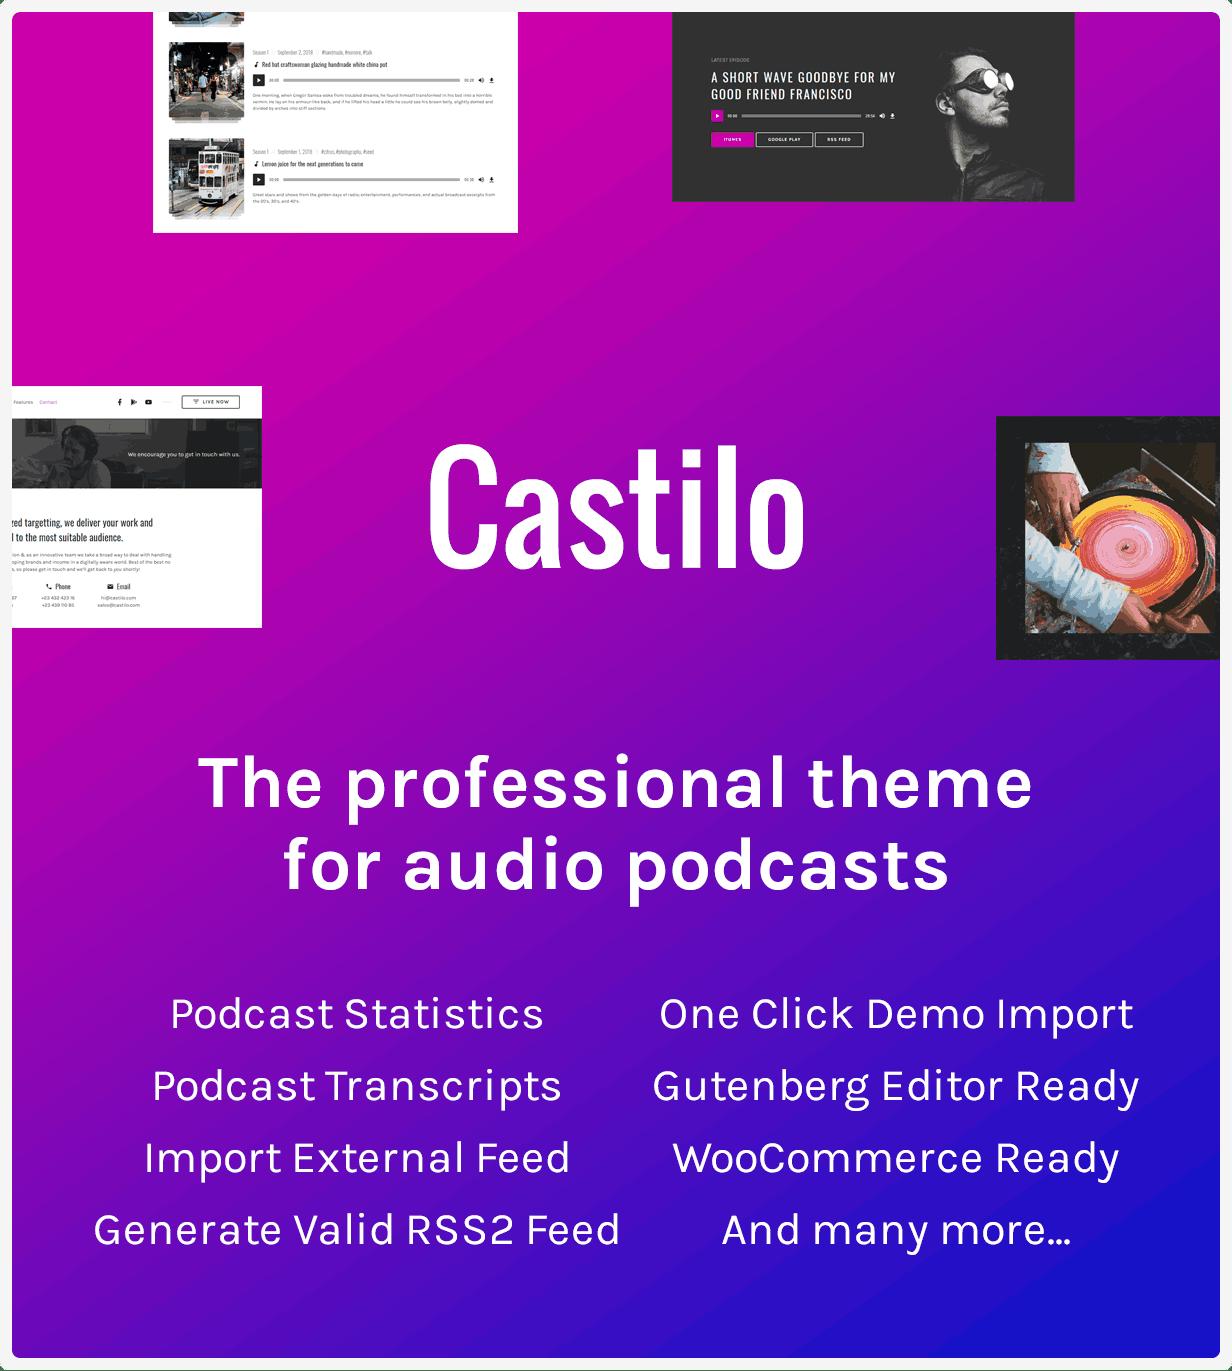 Themeforest   Castilo - Audio Podcast WordPress Theme Free Download #1 free download Themeforest   Castilo - Audio Podcast WordPress Theme Free Download #1 nulled Themeforest   Castilo - Audio Podcast WordPress Theme Free Download #1